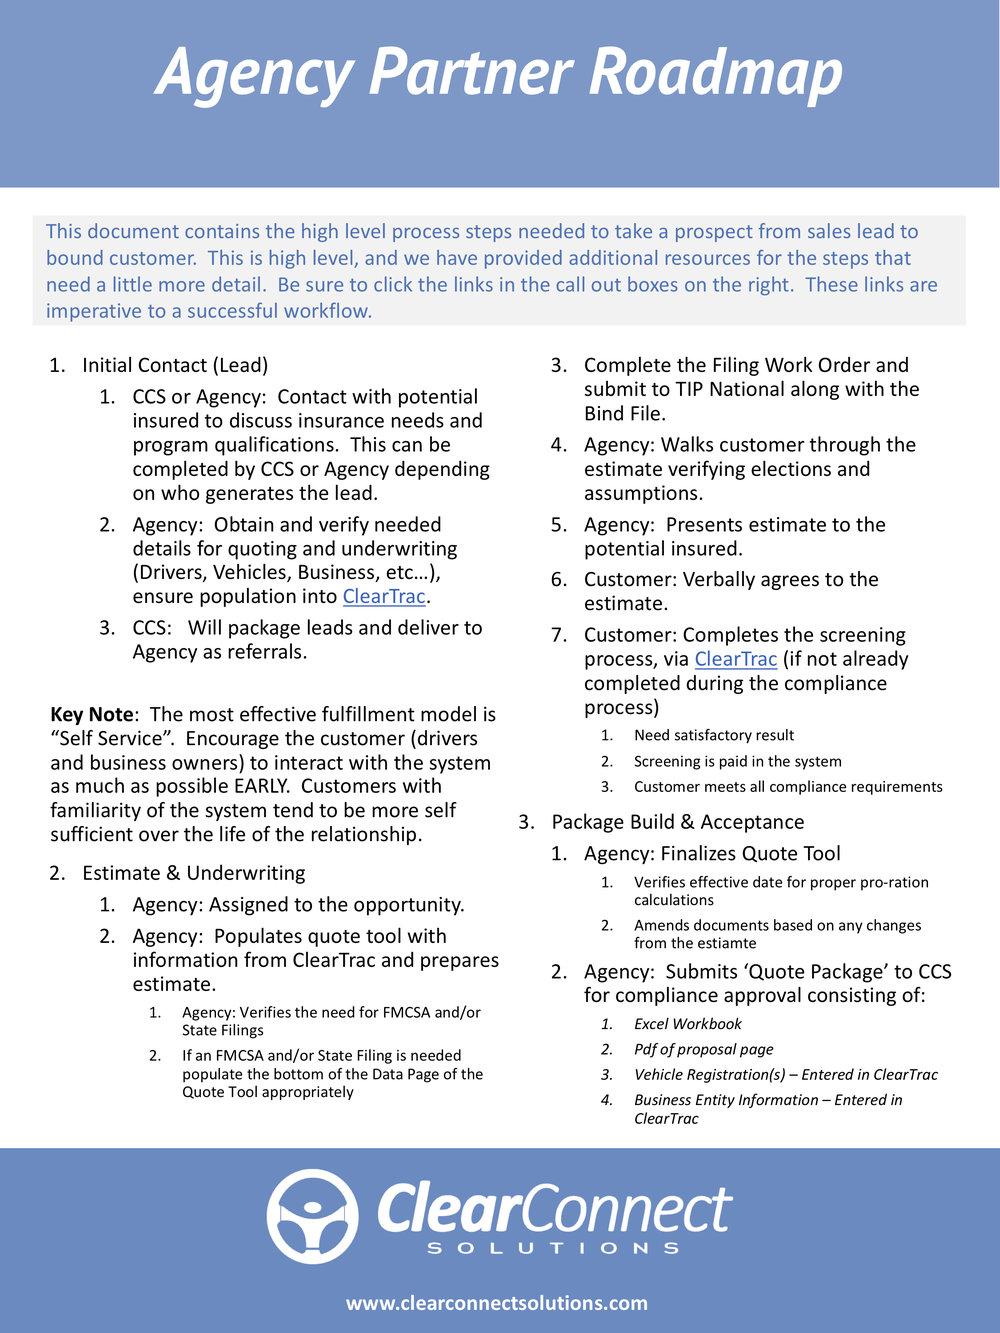 Agency Partner Roadmap - General.jpg